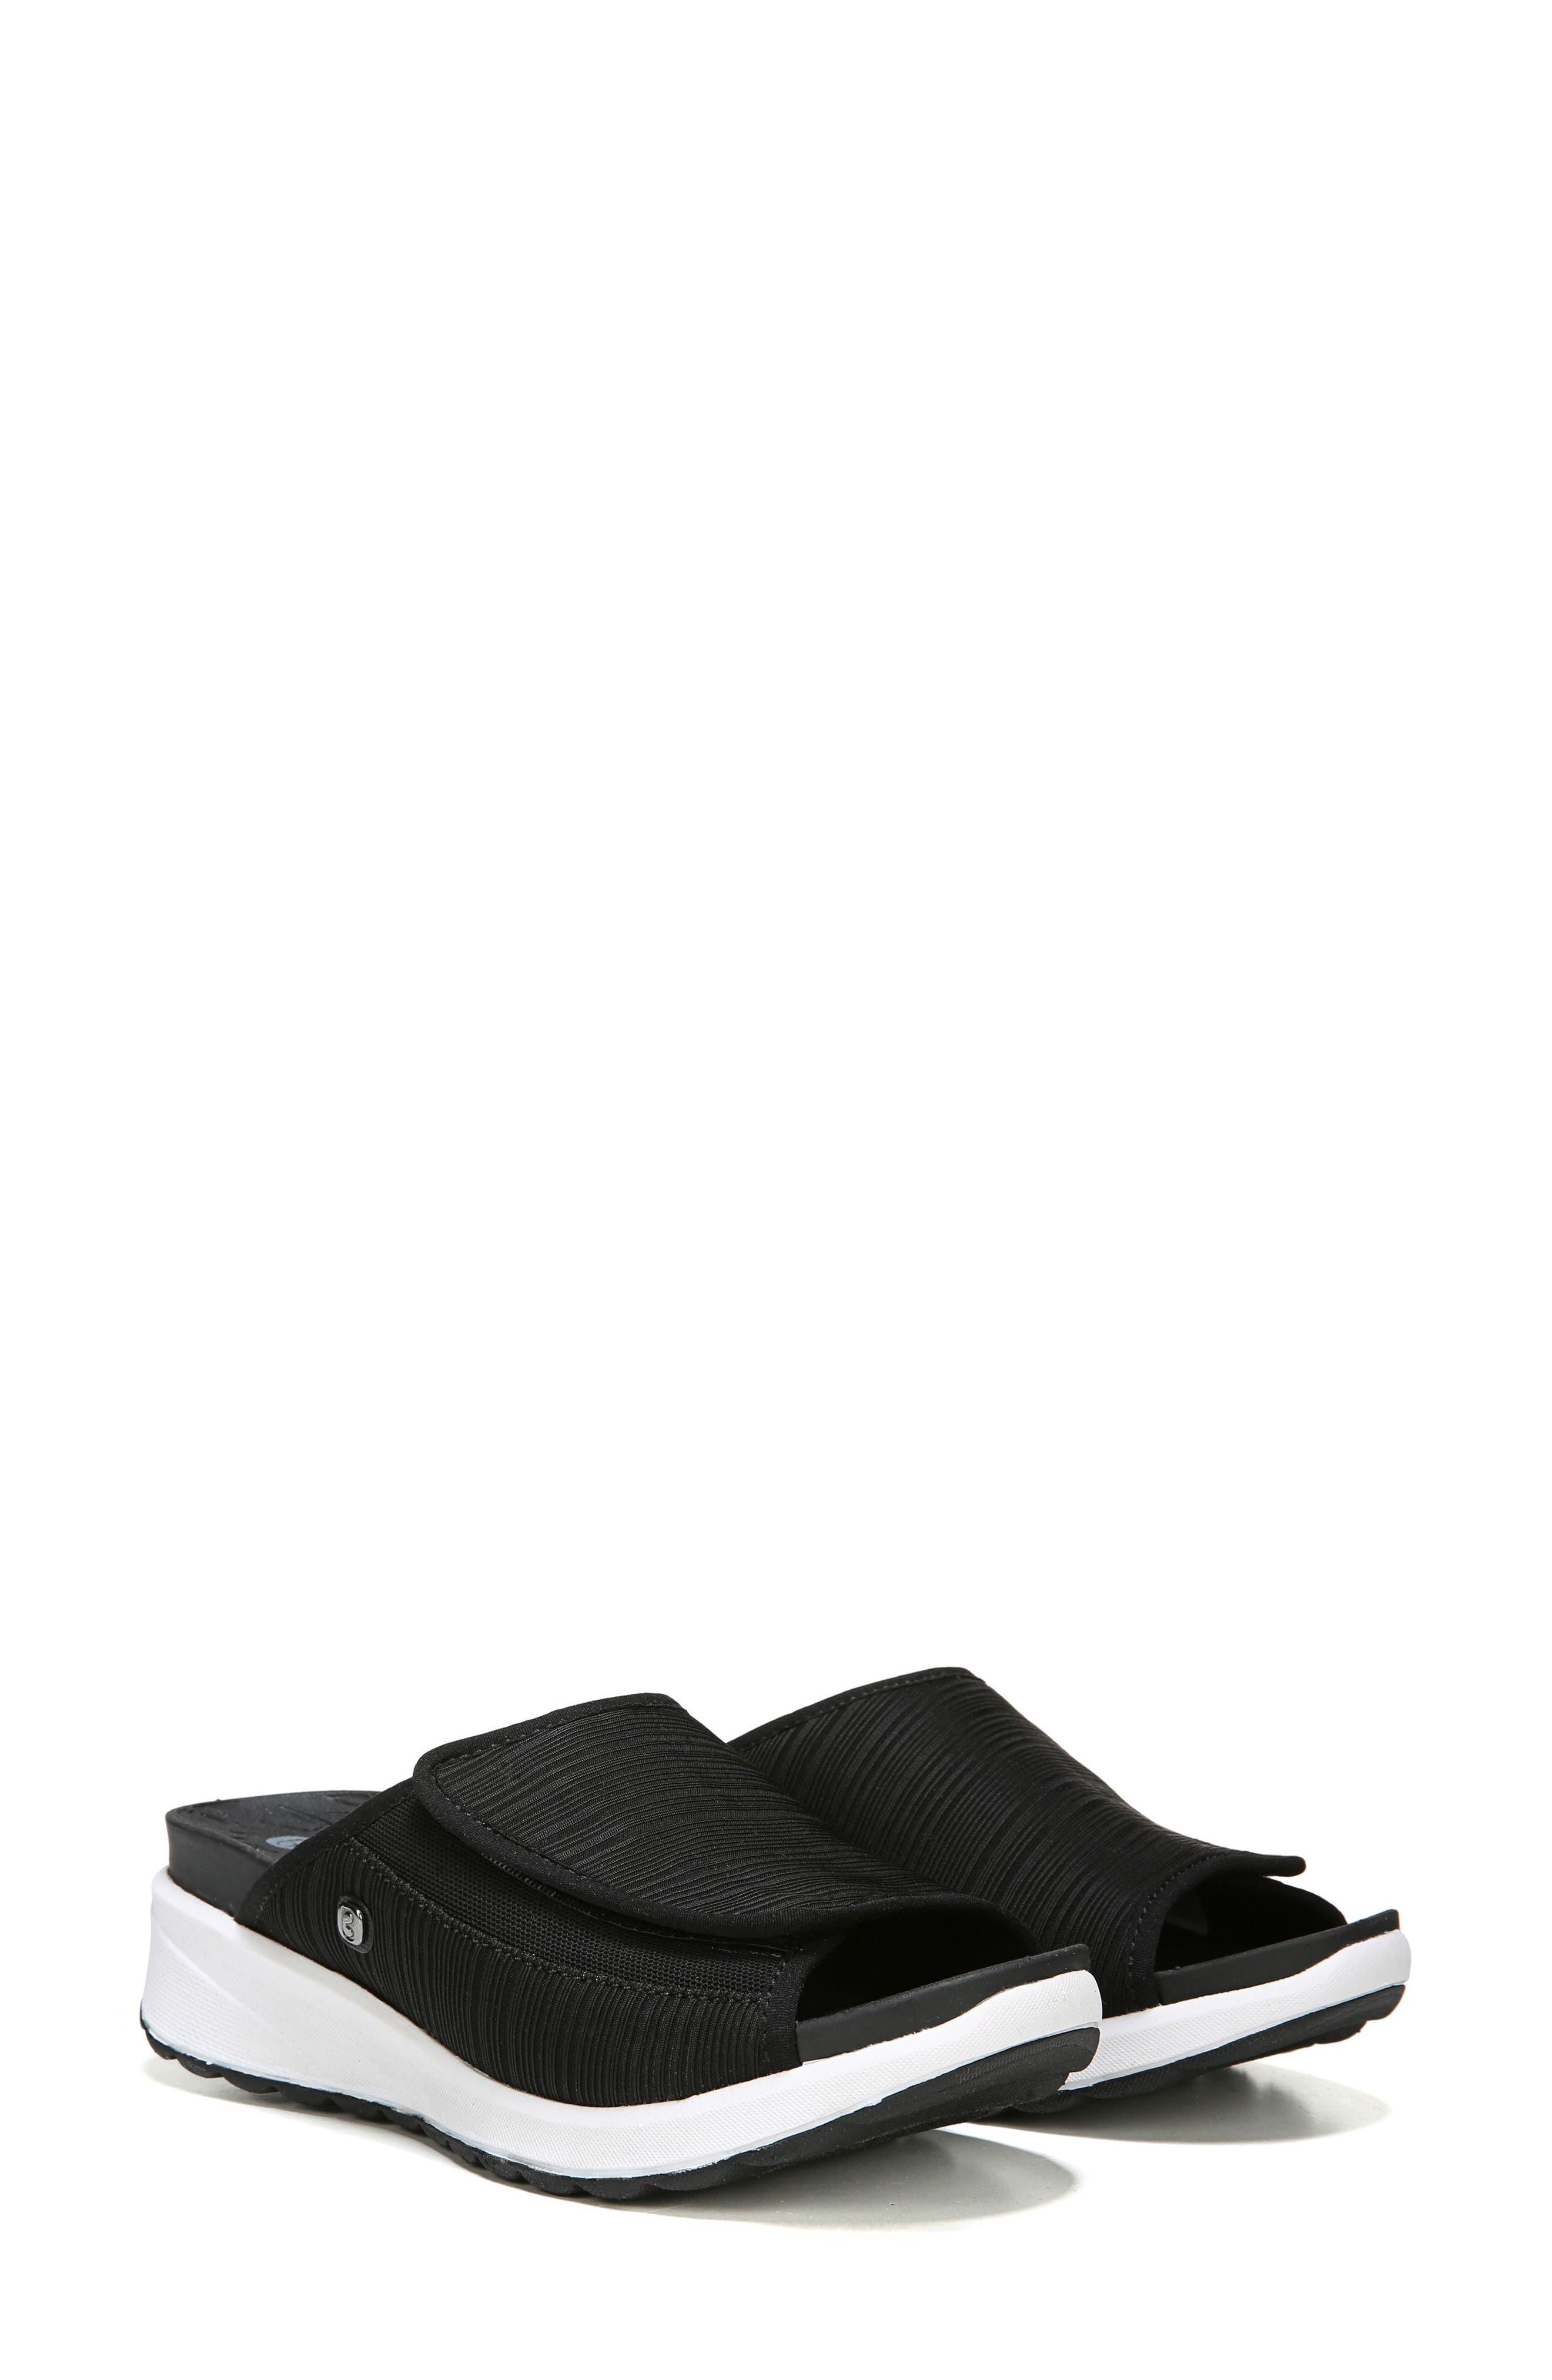 Galaxy Slide Sandal,                             Alternate thumbnail 7, color,                             BLACK FABRIC